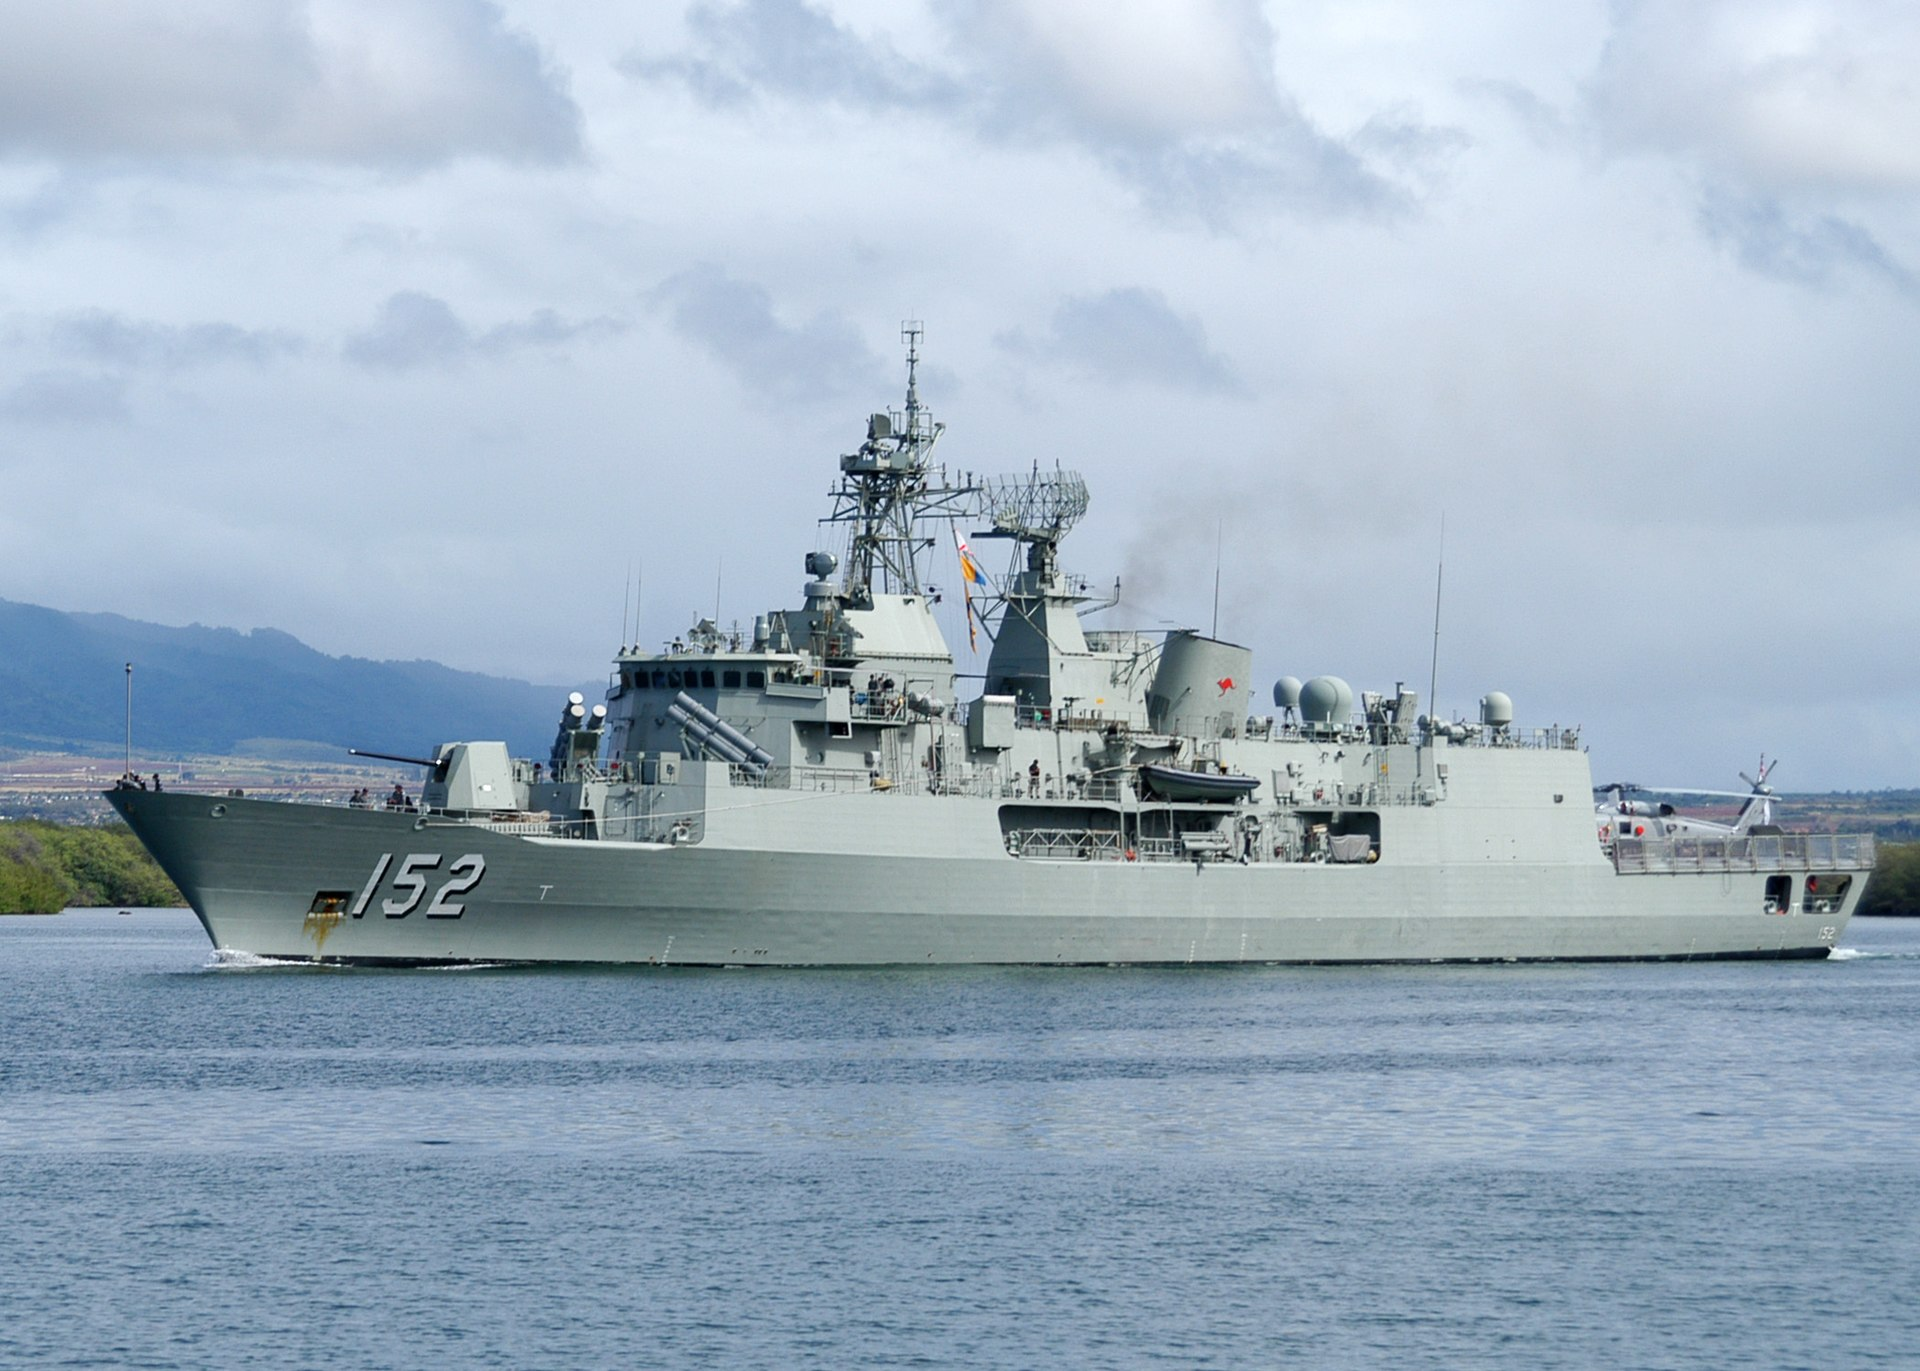 Anzac-class frigate - Wikipedia